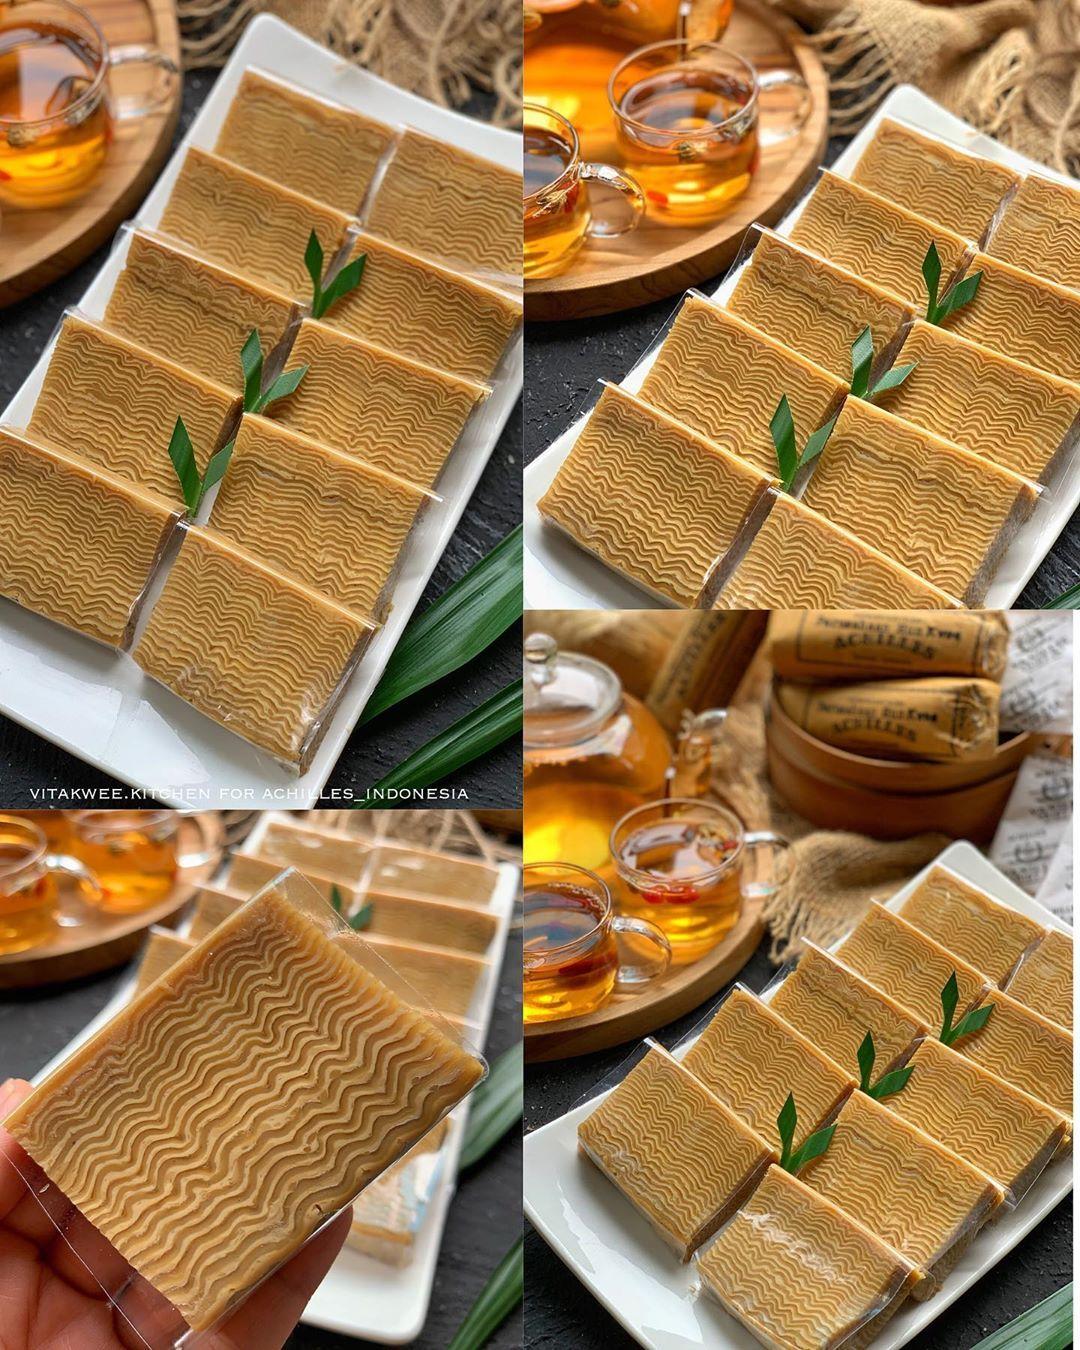 Vitakwee Kitchen Di Instagram Siang Mak Yang Doyan Kue Tradisional Yuk Merapat Mak Bikin Lapis India Jangan Tanya Kenapa Lapis India Namanya Ya Mak Juga